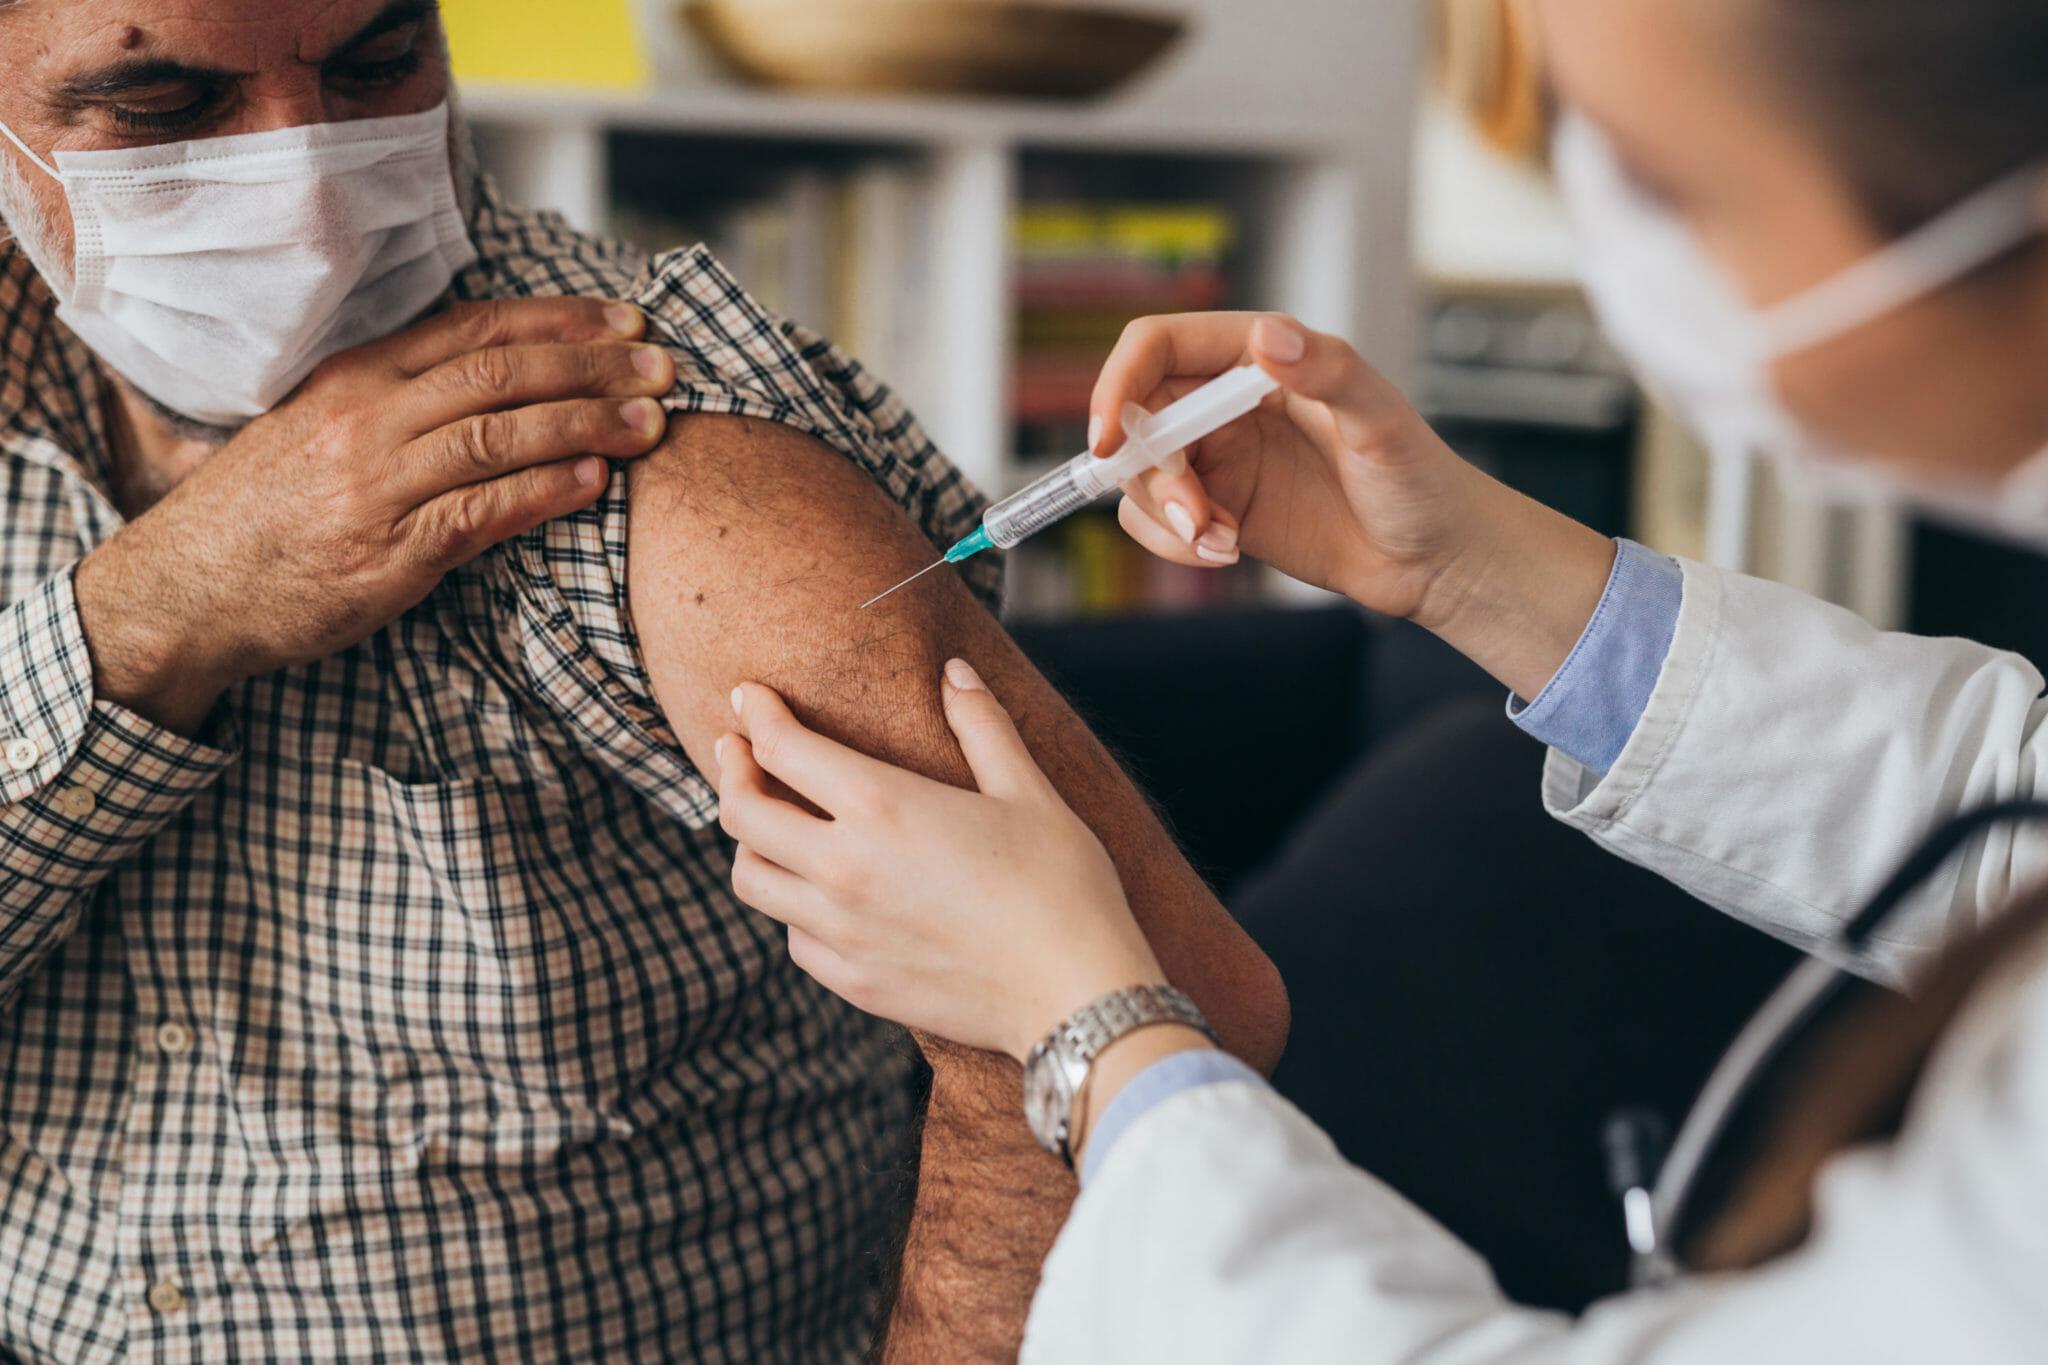 Person receiving vaccination